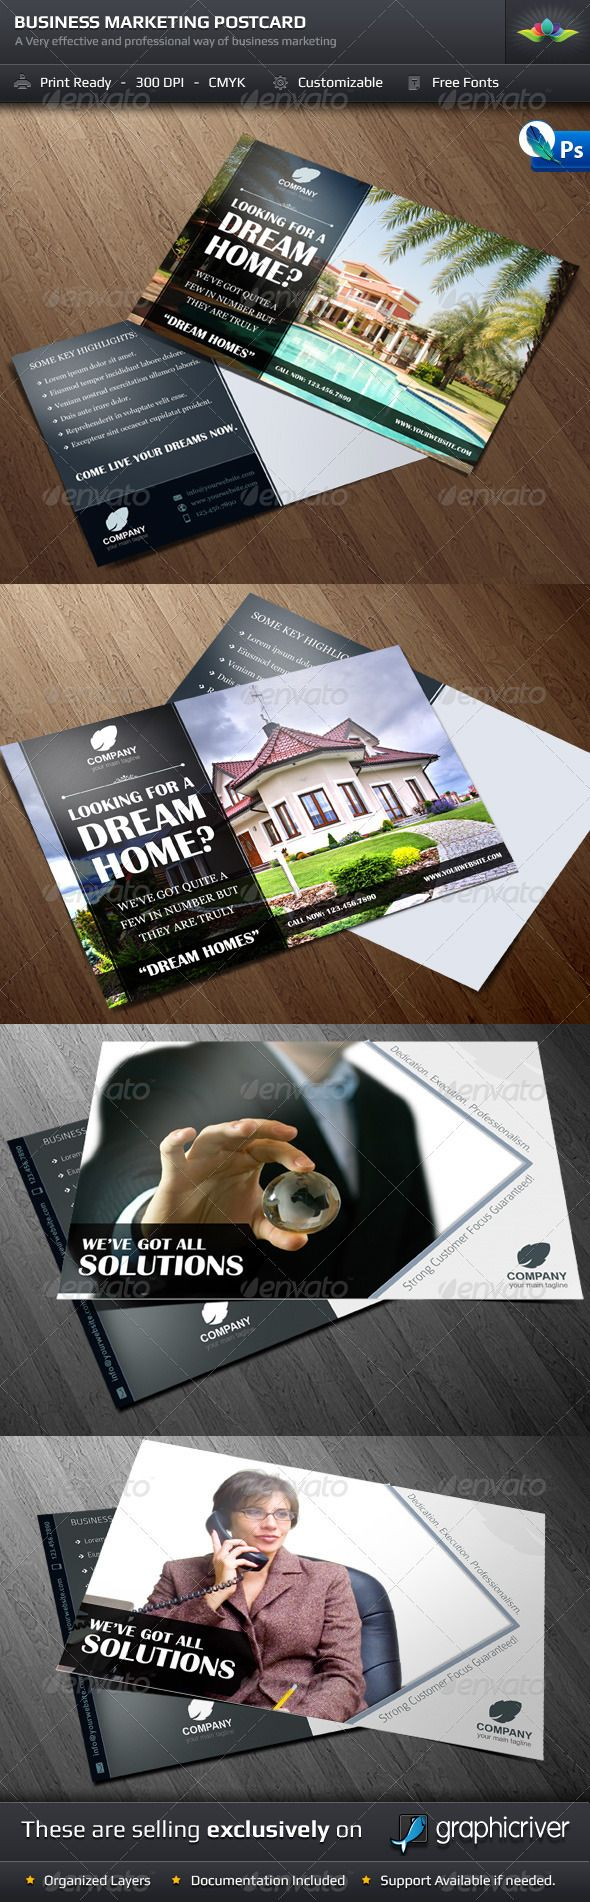 Business Marketing Postcard Template Set $6.00